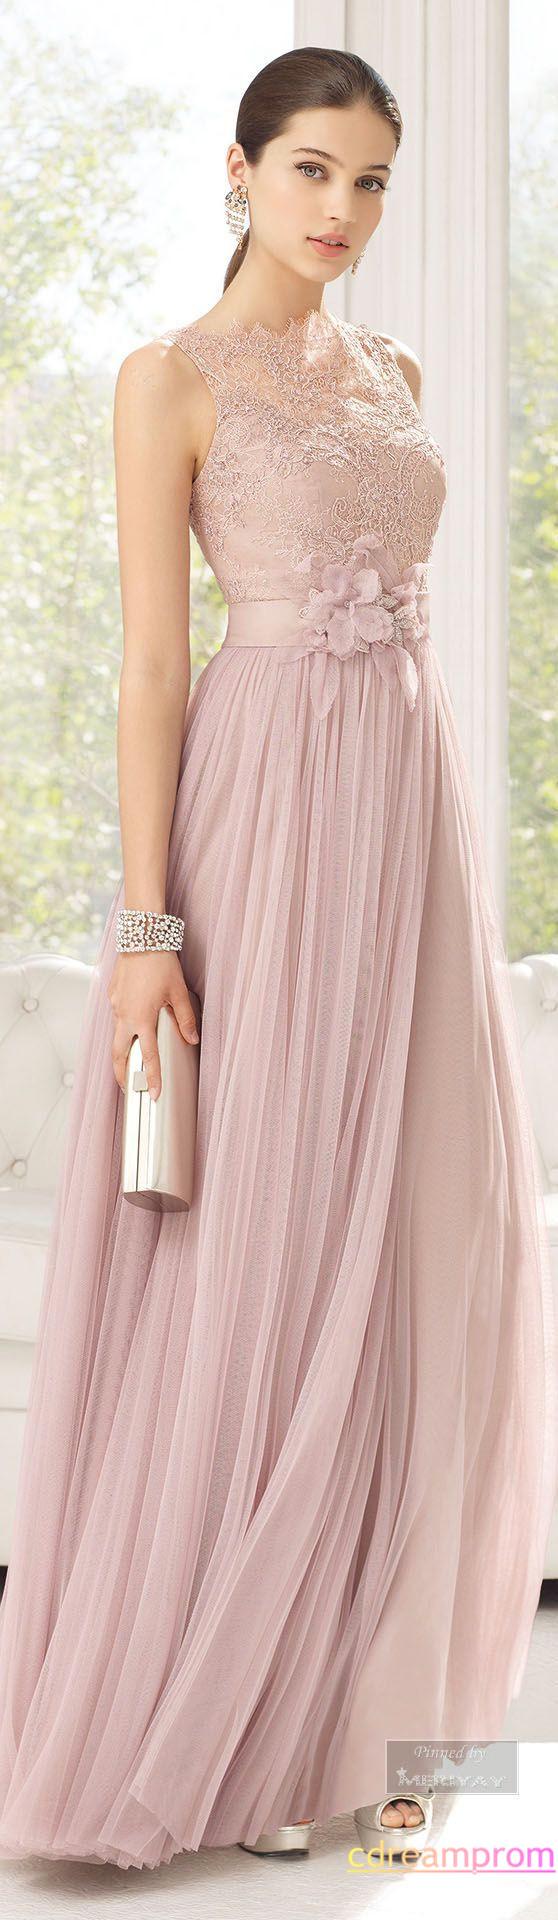 Elegant prom dress prom gown glamour and elegance pinterest